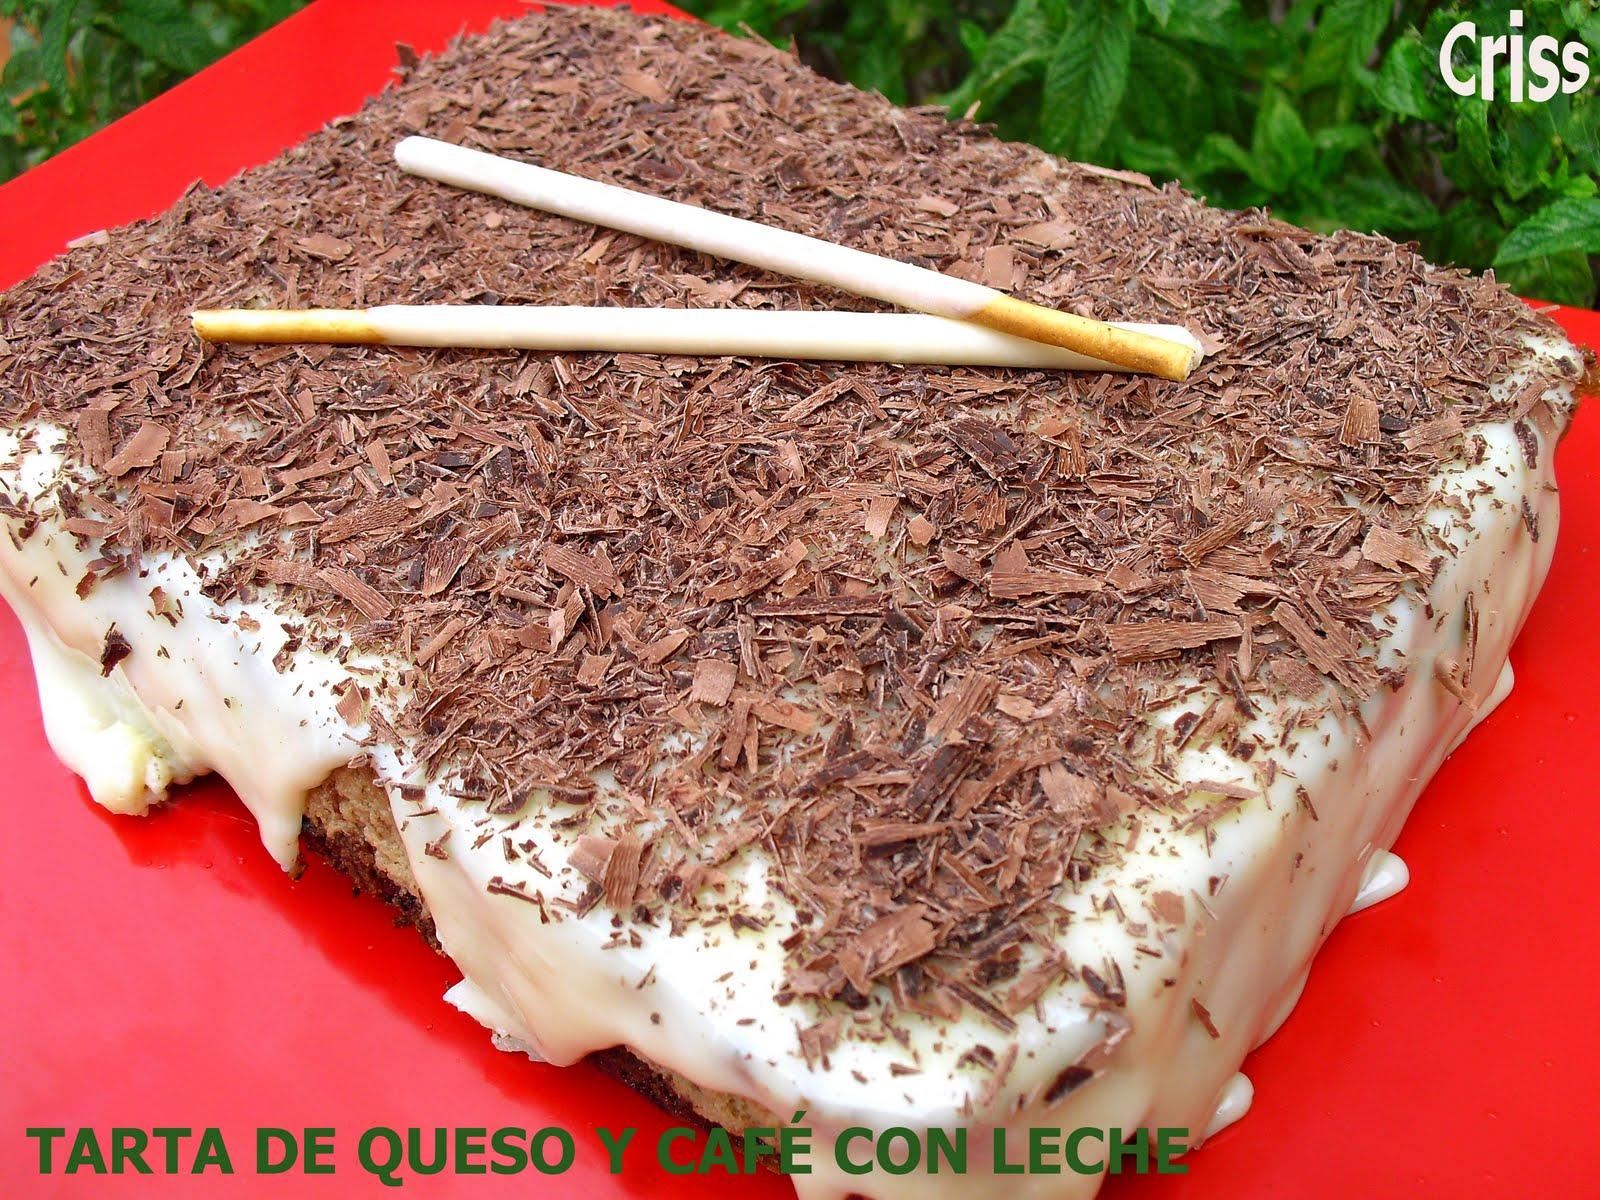 http://4.bp.blogspot.com/_Gl5CdBMHdxQ/TFAsuptPOOI/AAAAAAAAAP8/wmTyg8VKQHw/s1600/TARTA+DE+QUESO+Y+CAFÉ+CON+LECHE.jpg